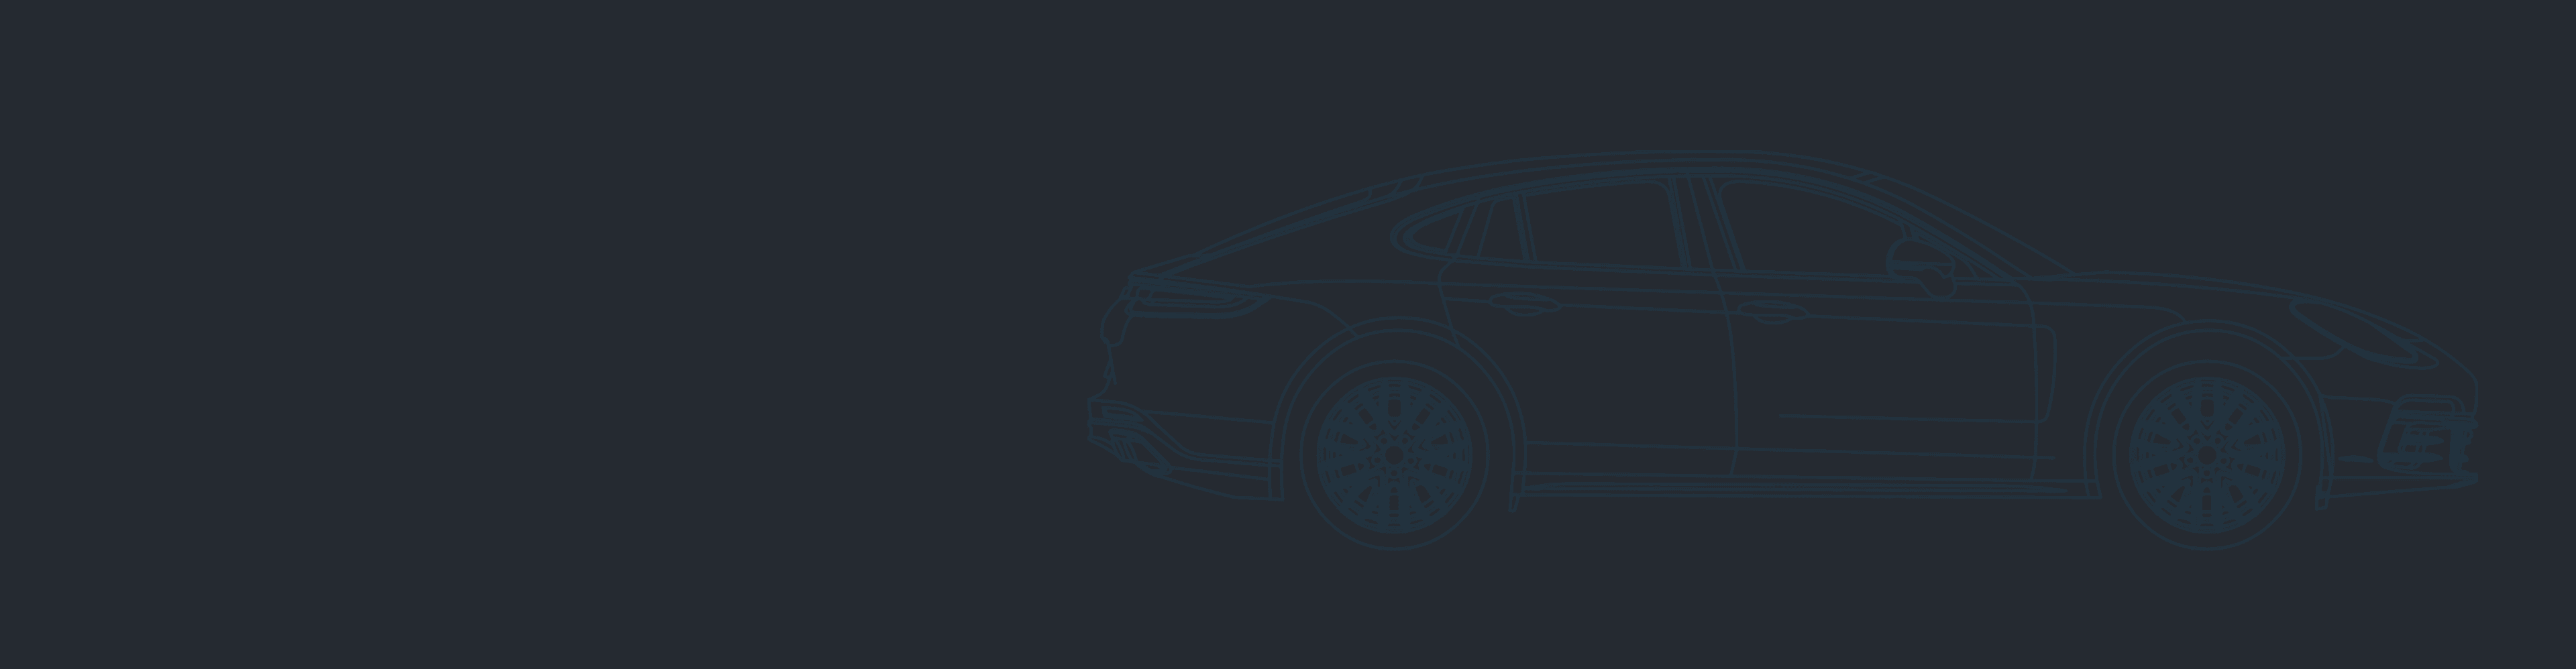 IoT automotive app development highlights